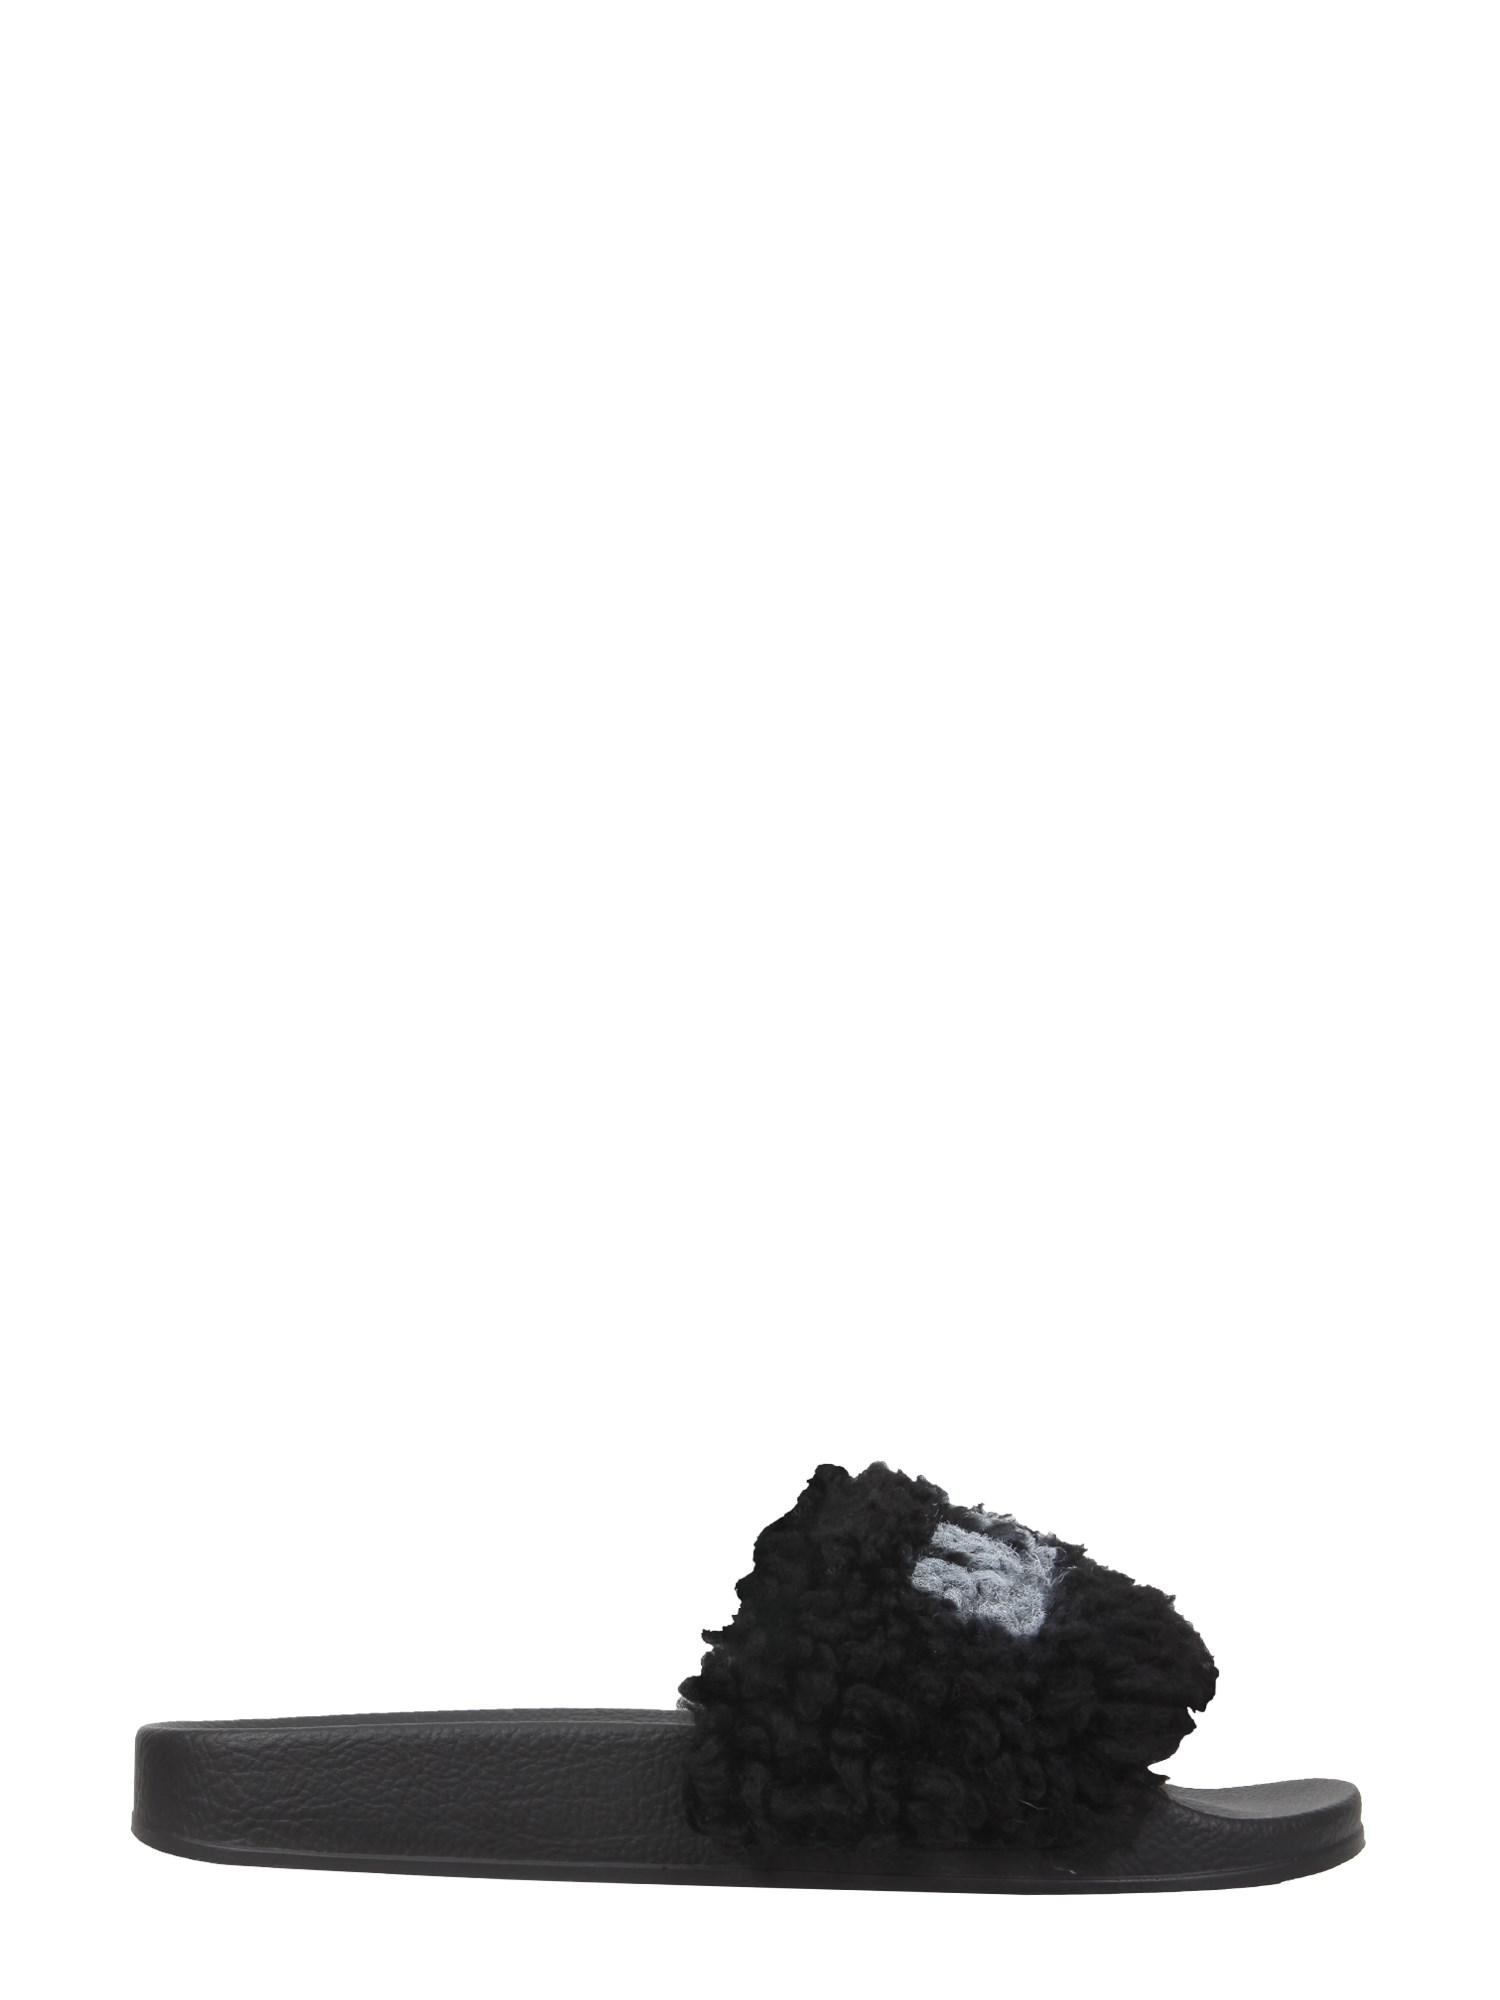 marni slide sandals with logo